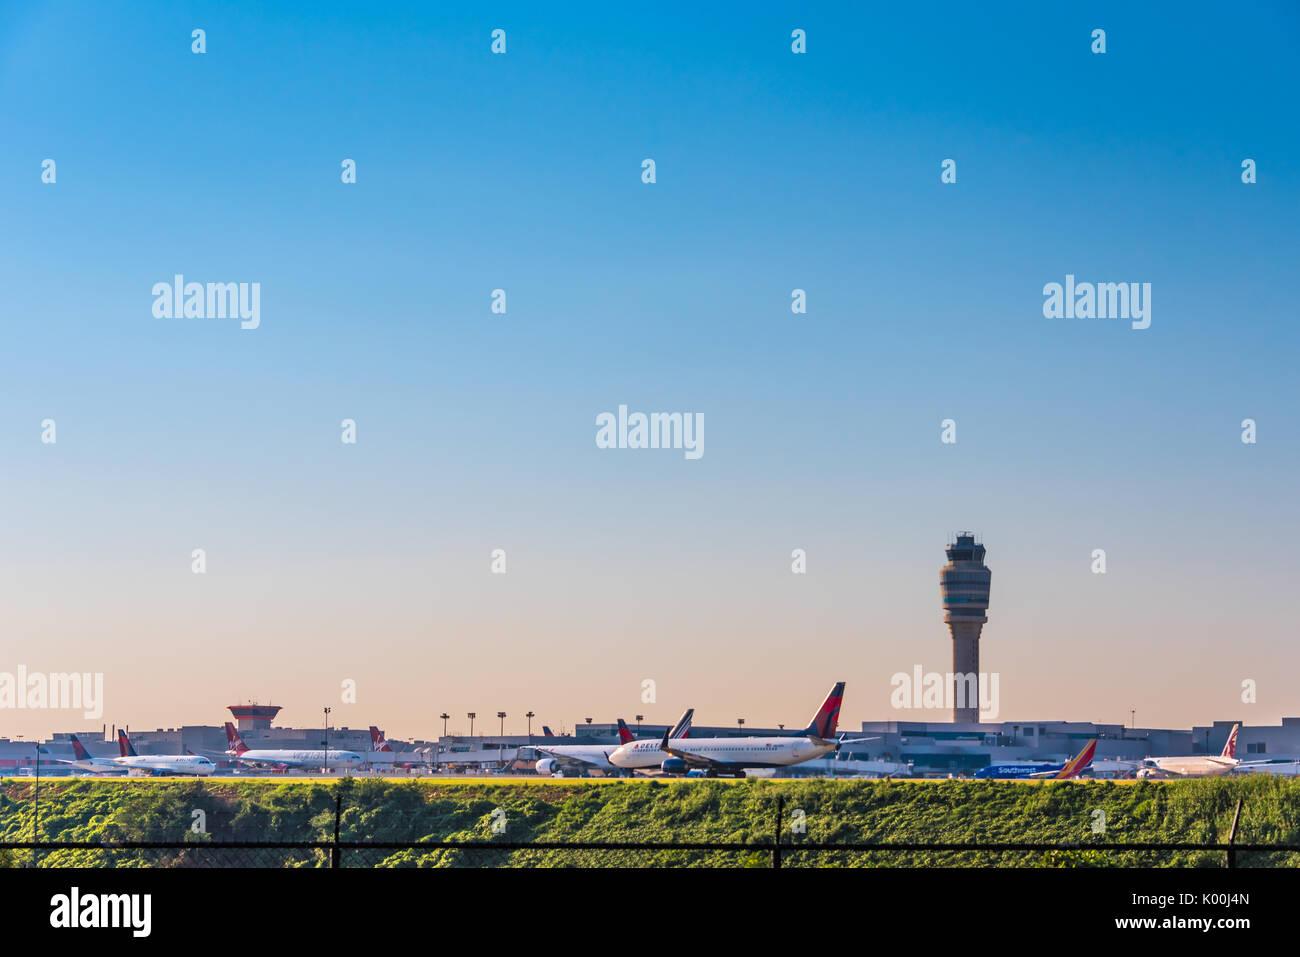 Atlanta, Georgia airline traffic at Hartsfield-Jackson Atlanta International Airport, the world's busiest airport. (USA) - Stock Image